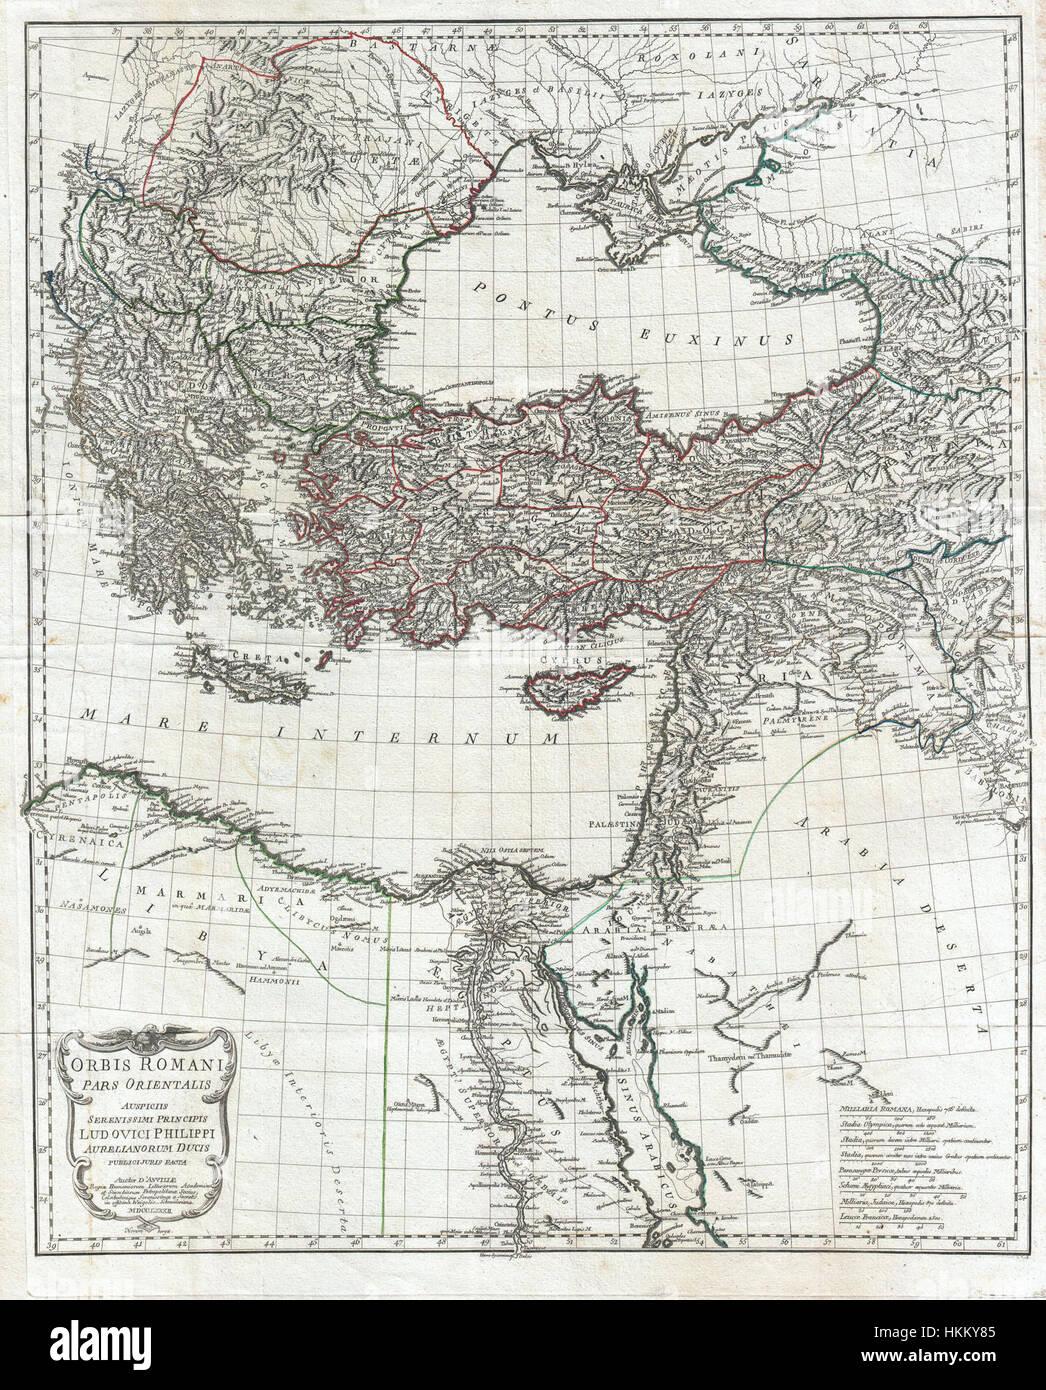 1782 La carte d'Anville de l'Empire romain - Geographicus - RomanEmpireEast-anville-1782 Photo Stock